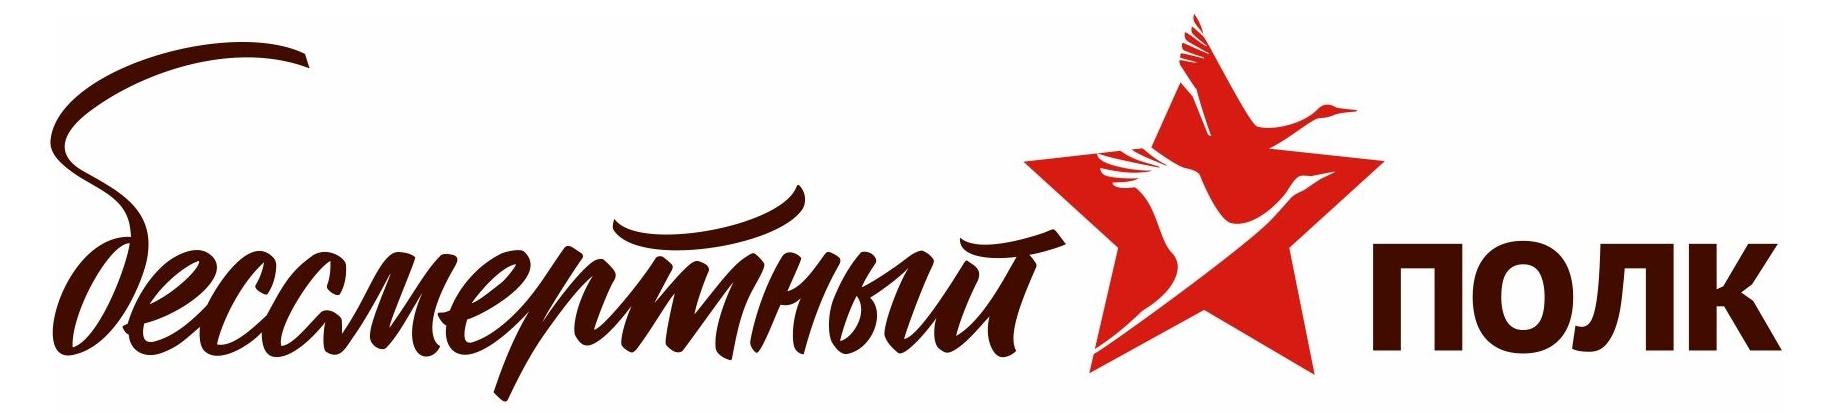 Климт 2005 смотреть онлайн   Zonamobi